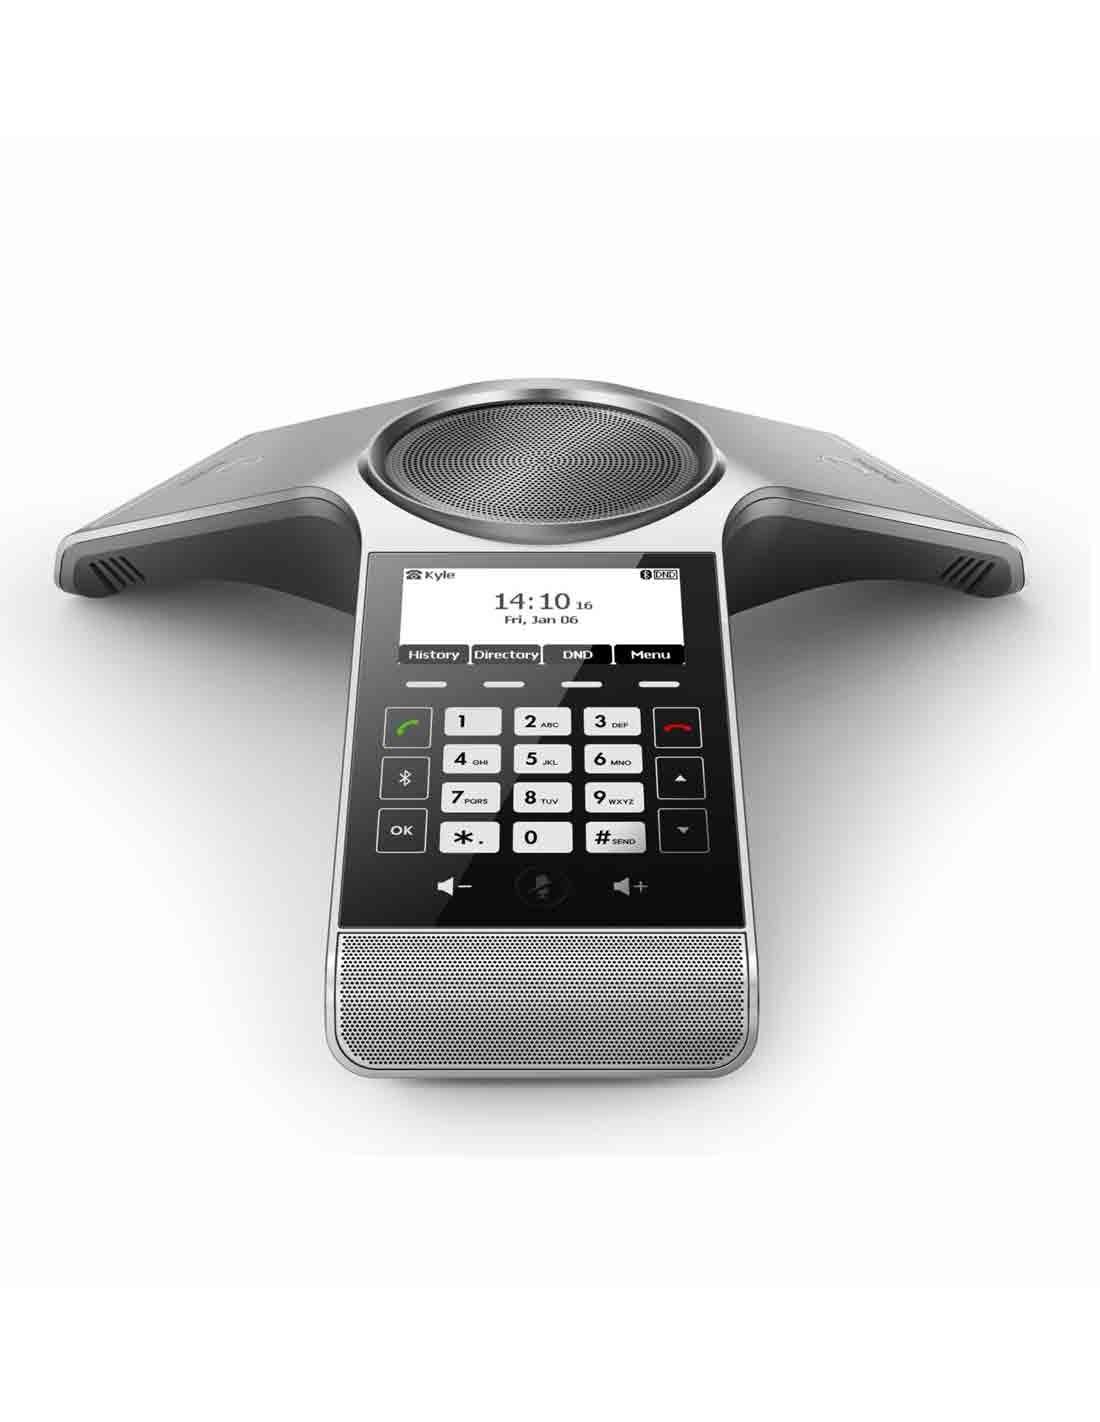 Yealink CP920 IP Phone Images